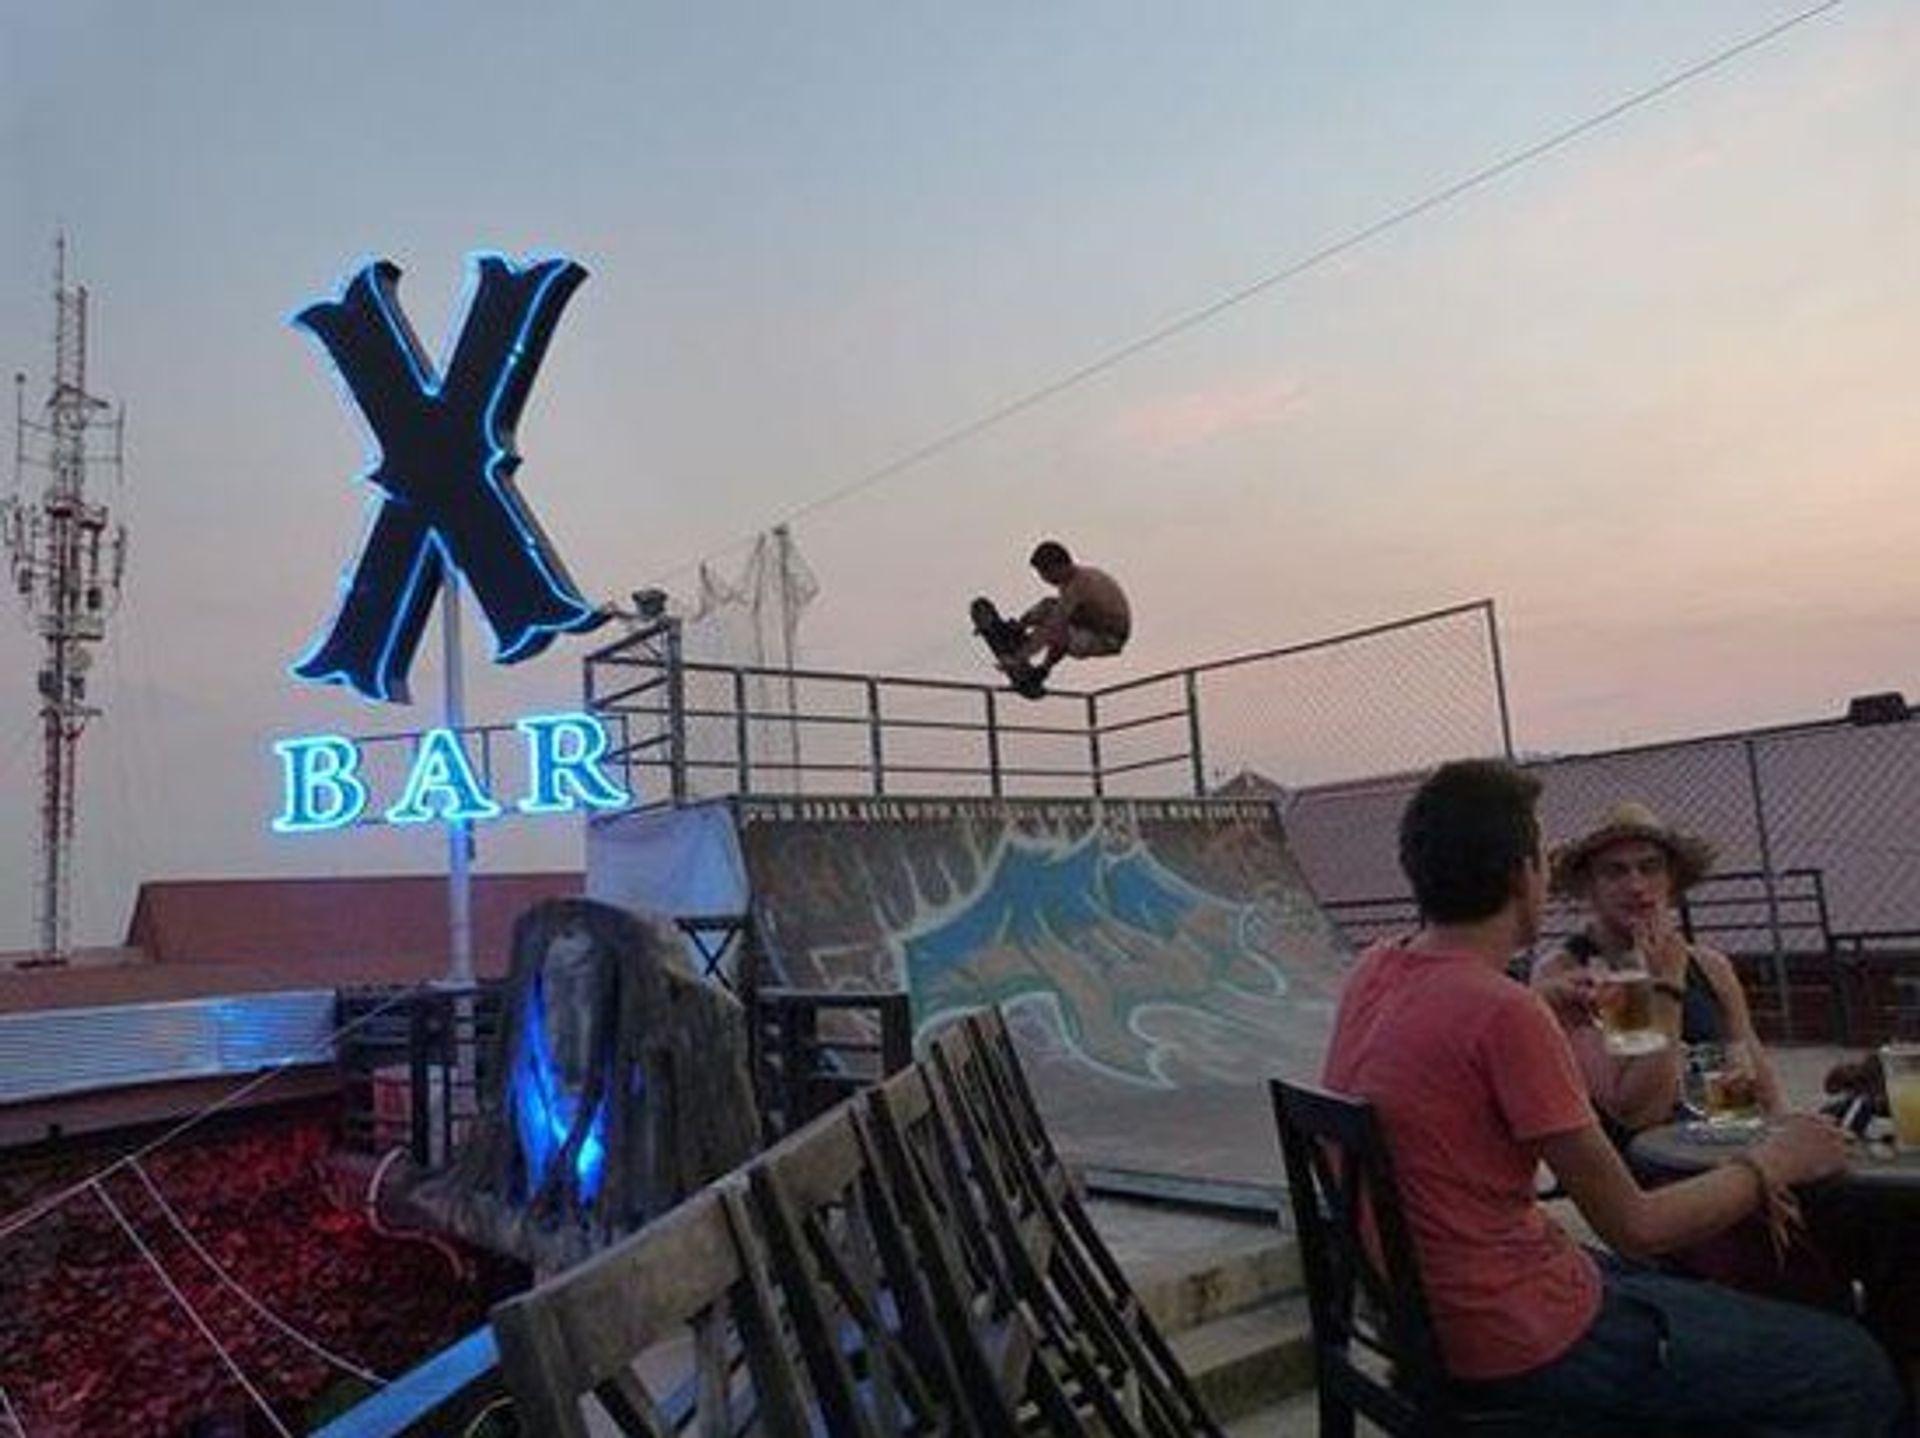 Quán bar X